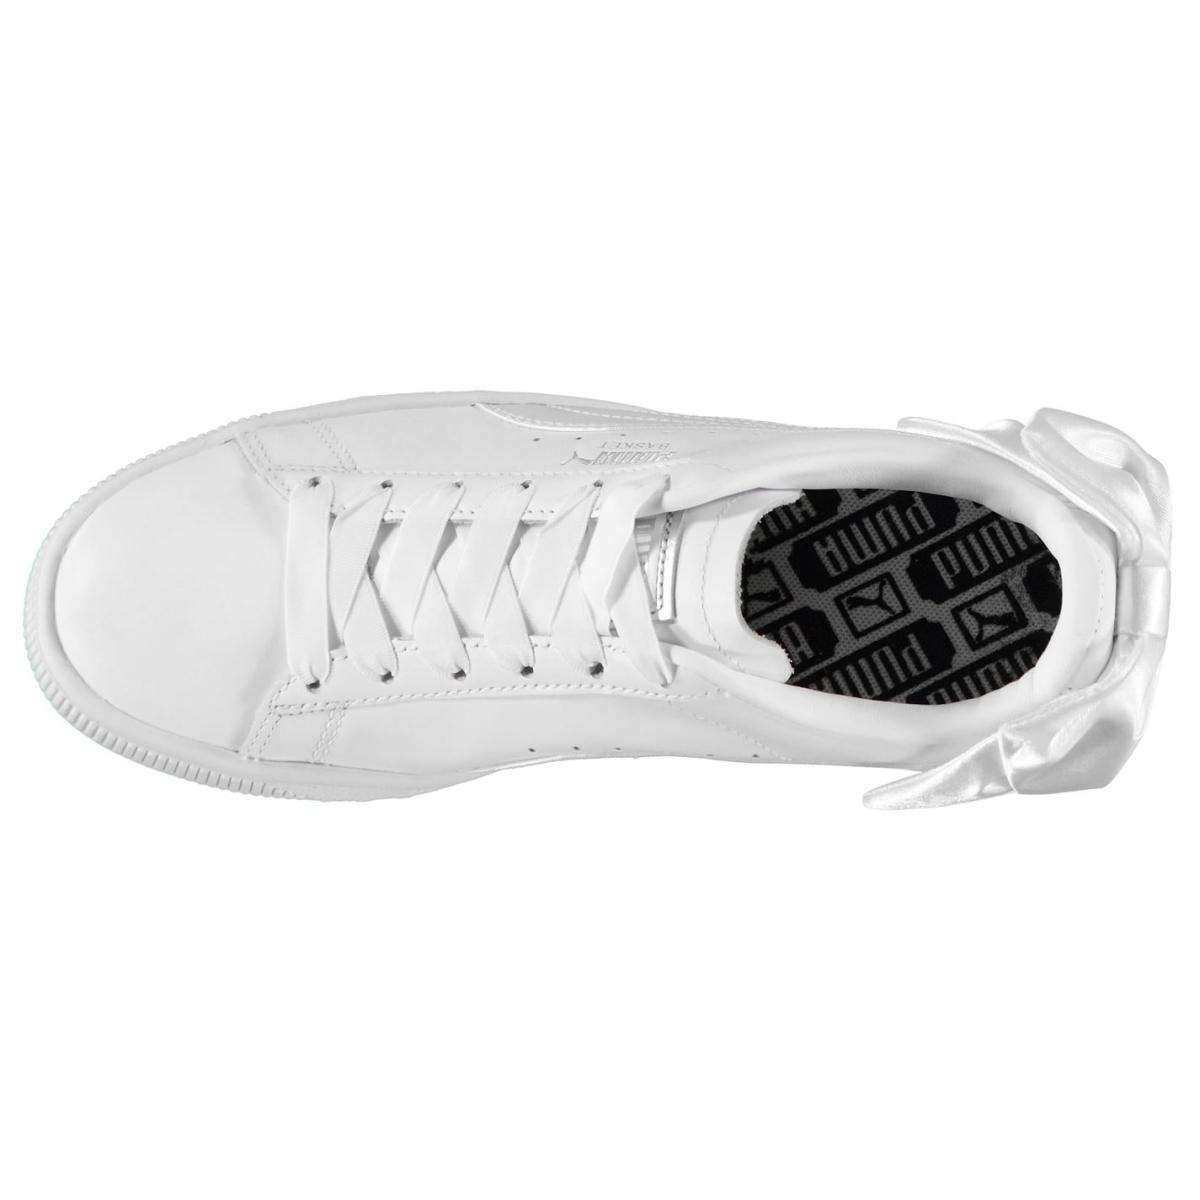 Puma-Basket-Turnschuhe-Damen-Sneaker-Sportschuhe-Laufschuhe-9061 Indexbild 7